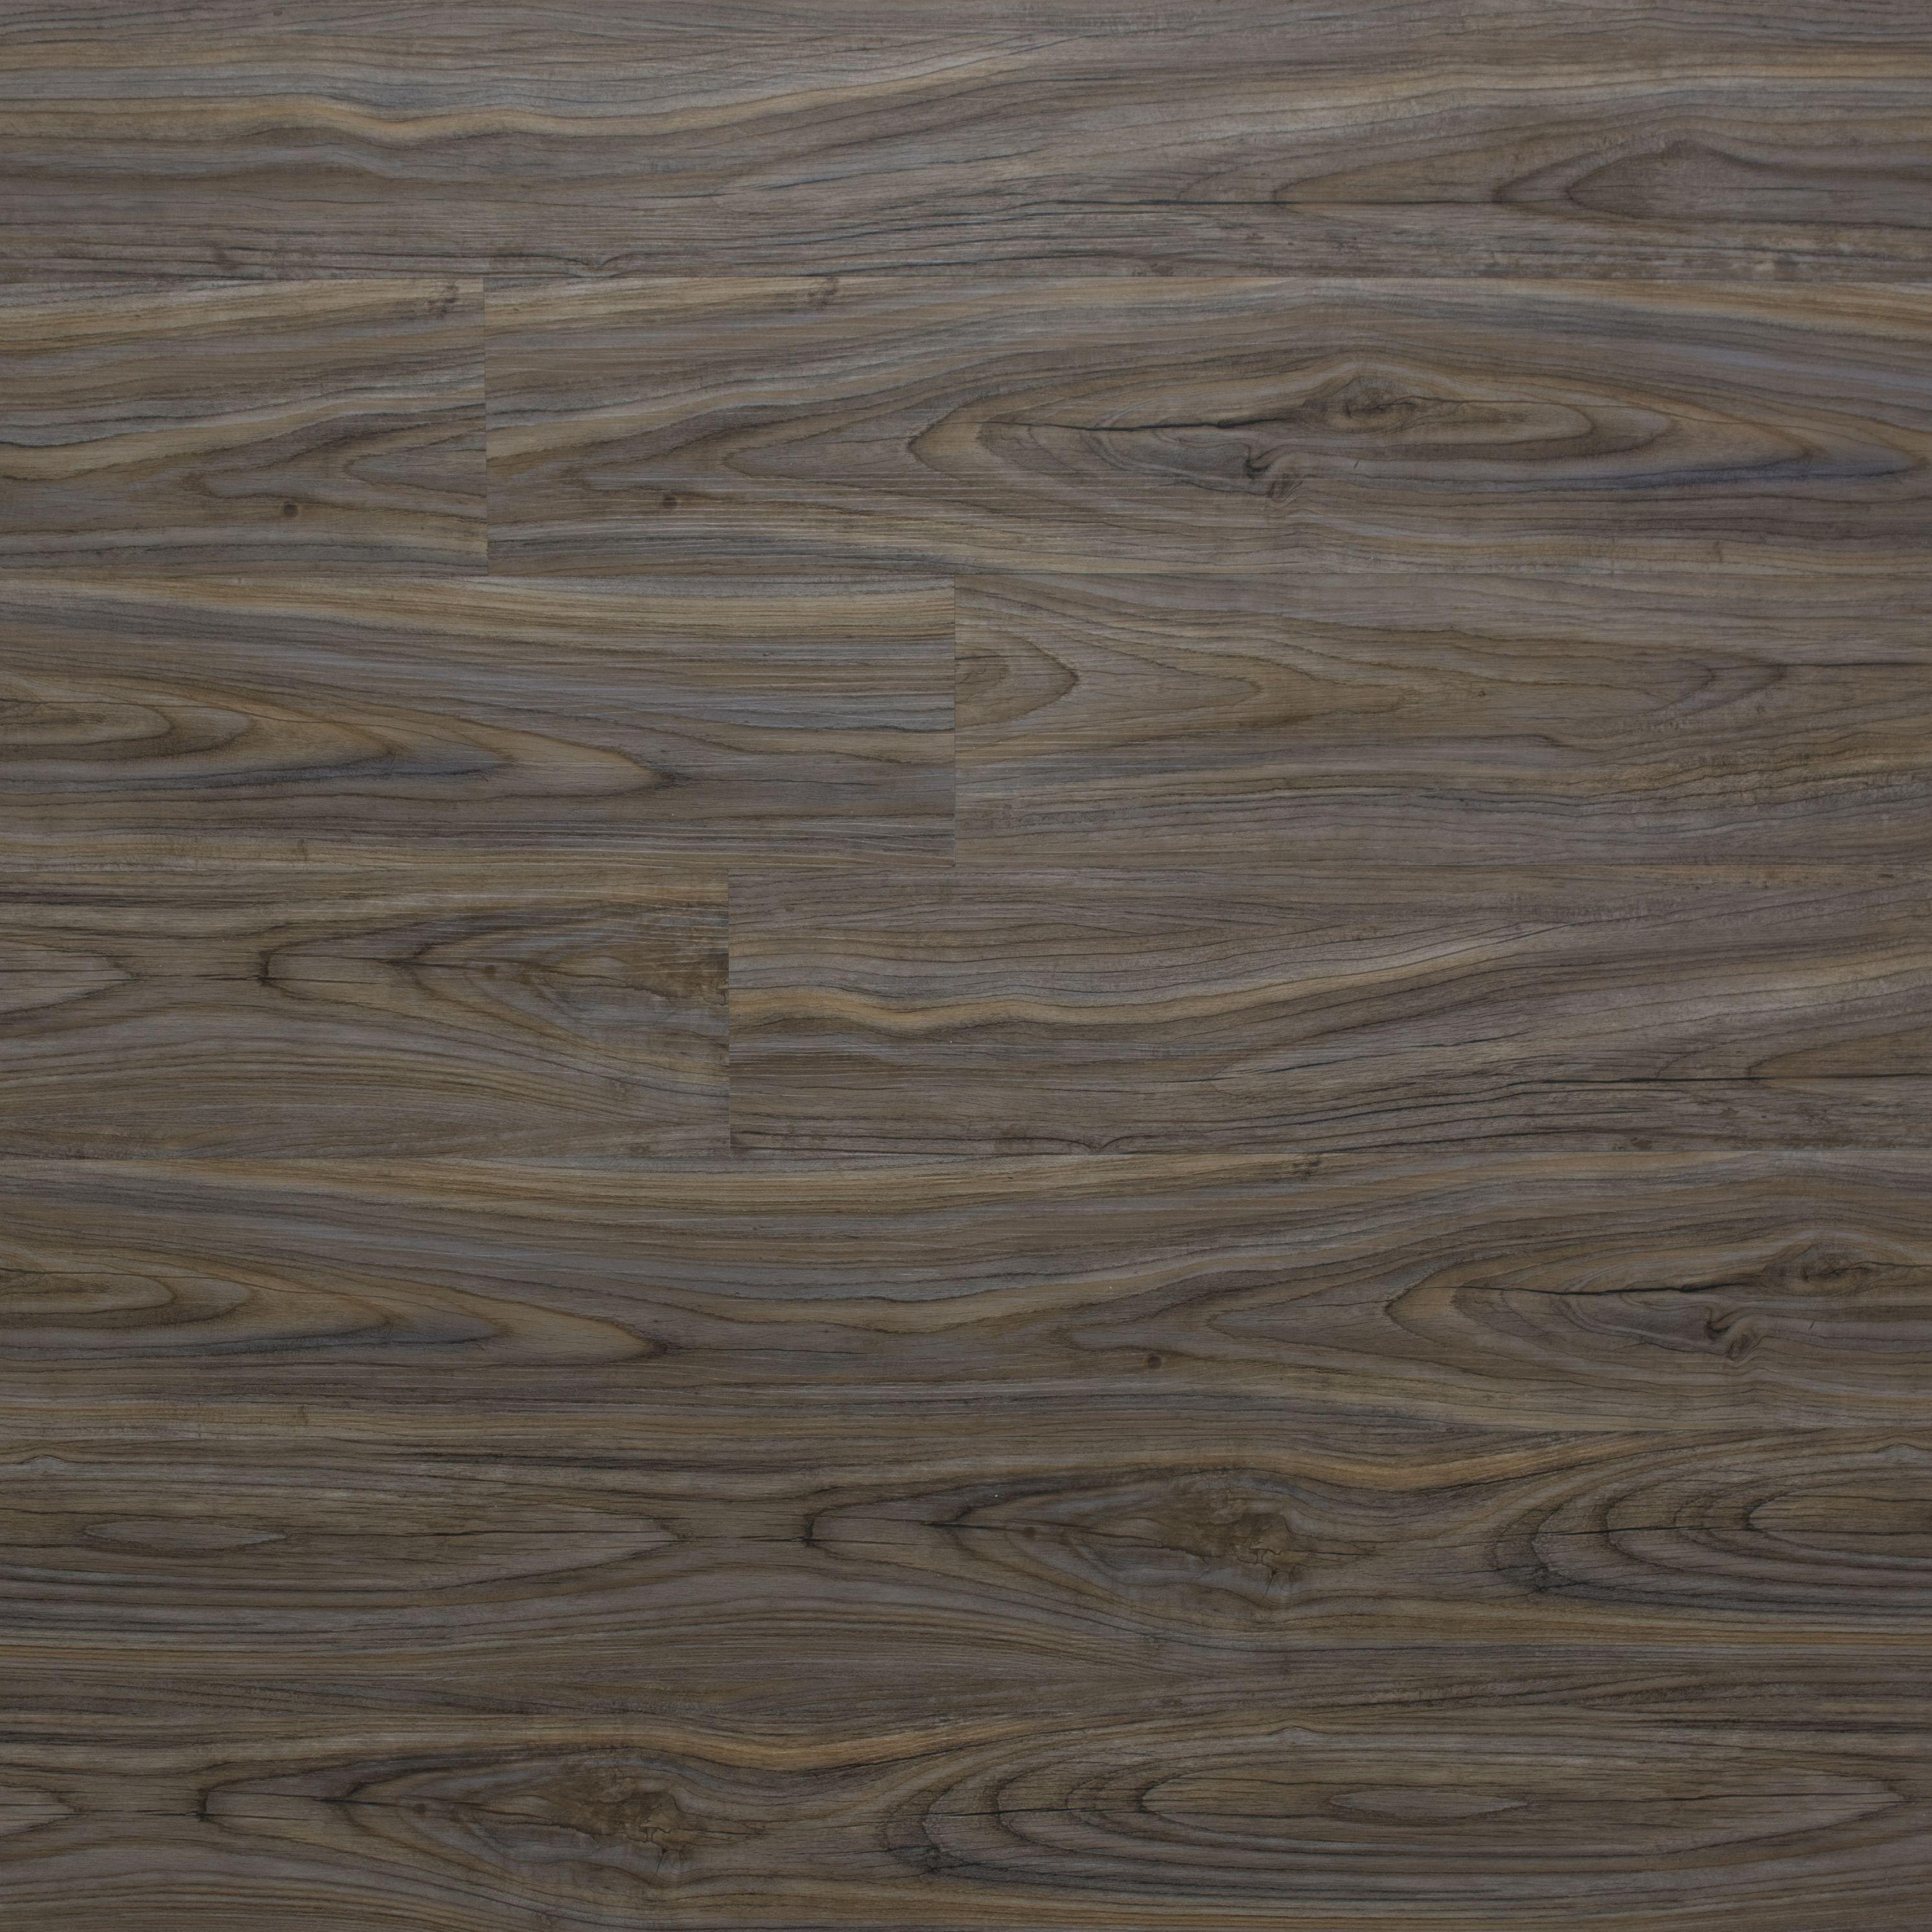 New Waterproof Vinyl Flooring Color Mirage Waterproof Vinyl